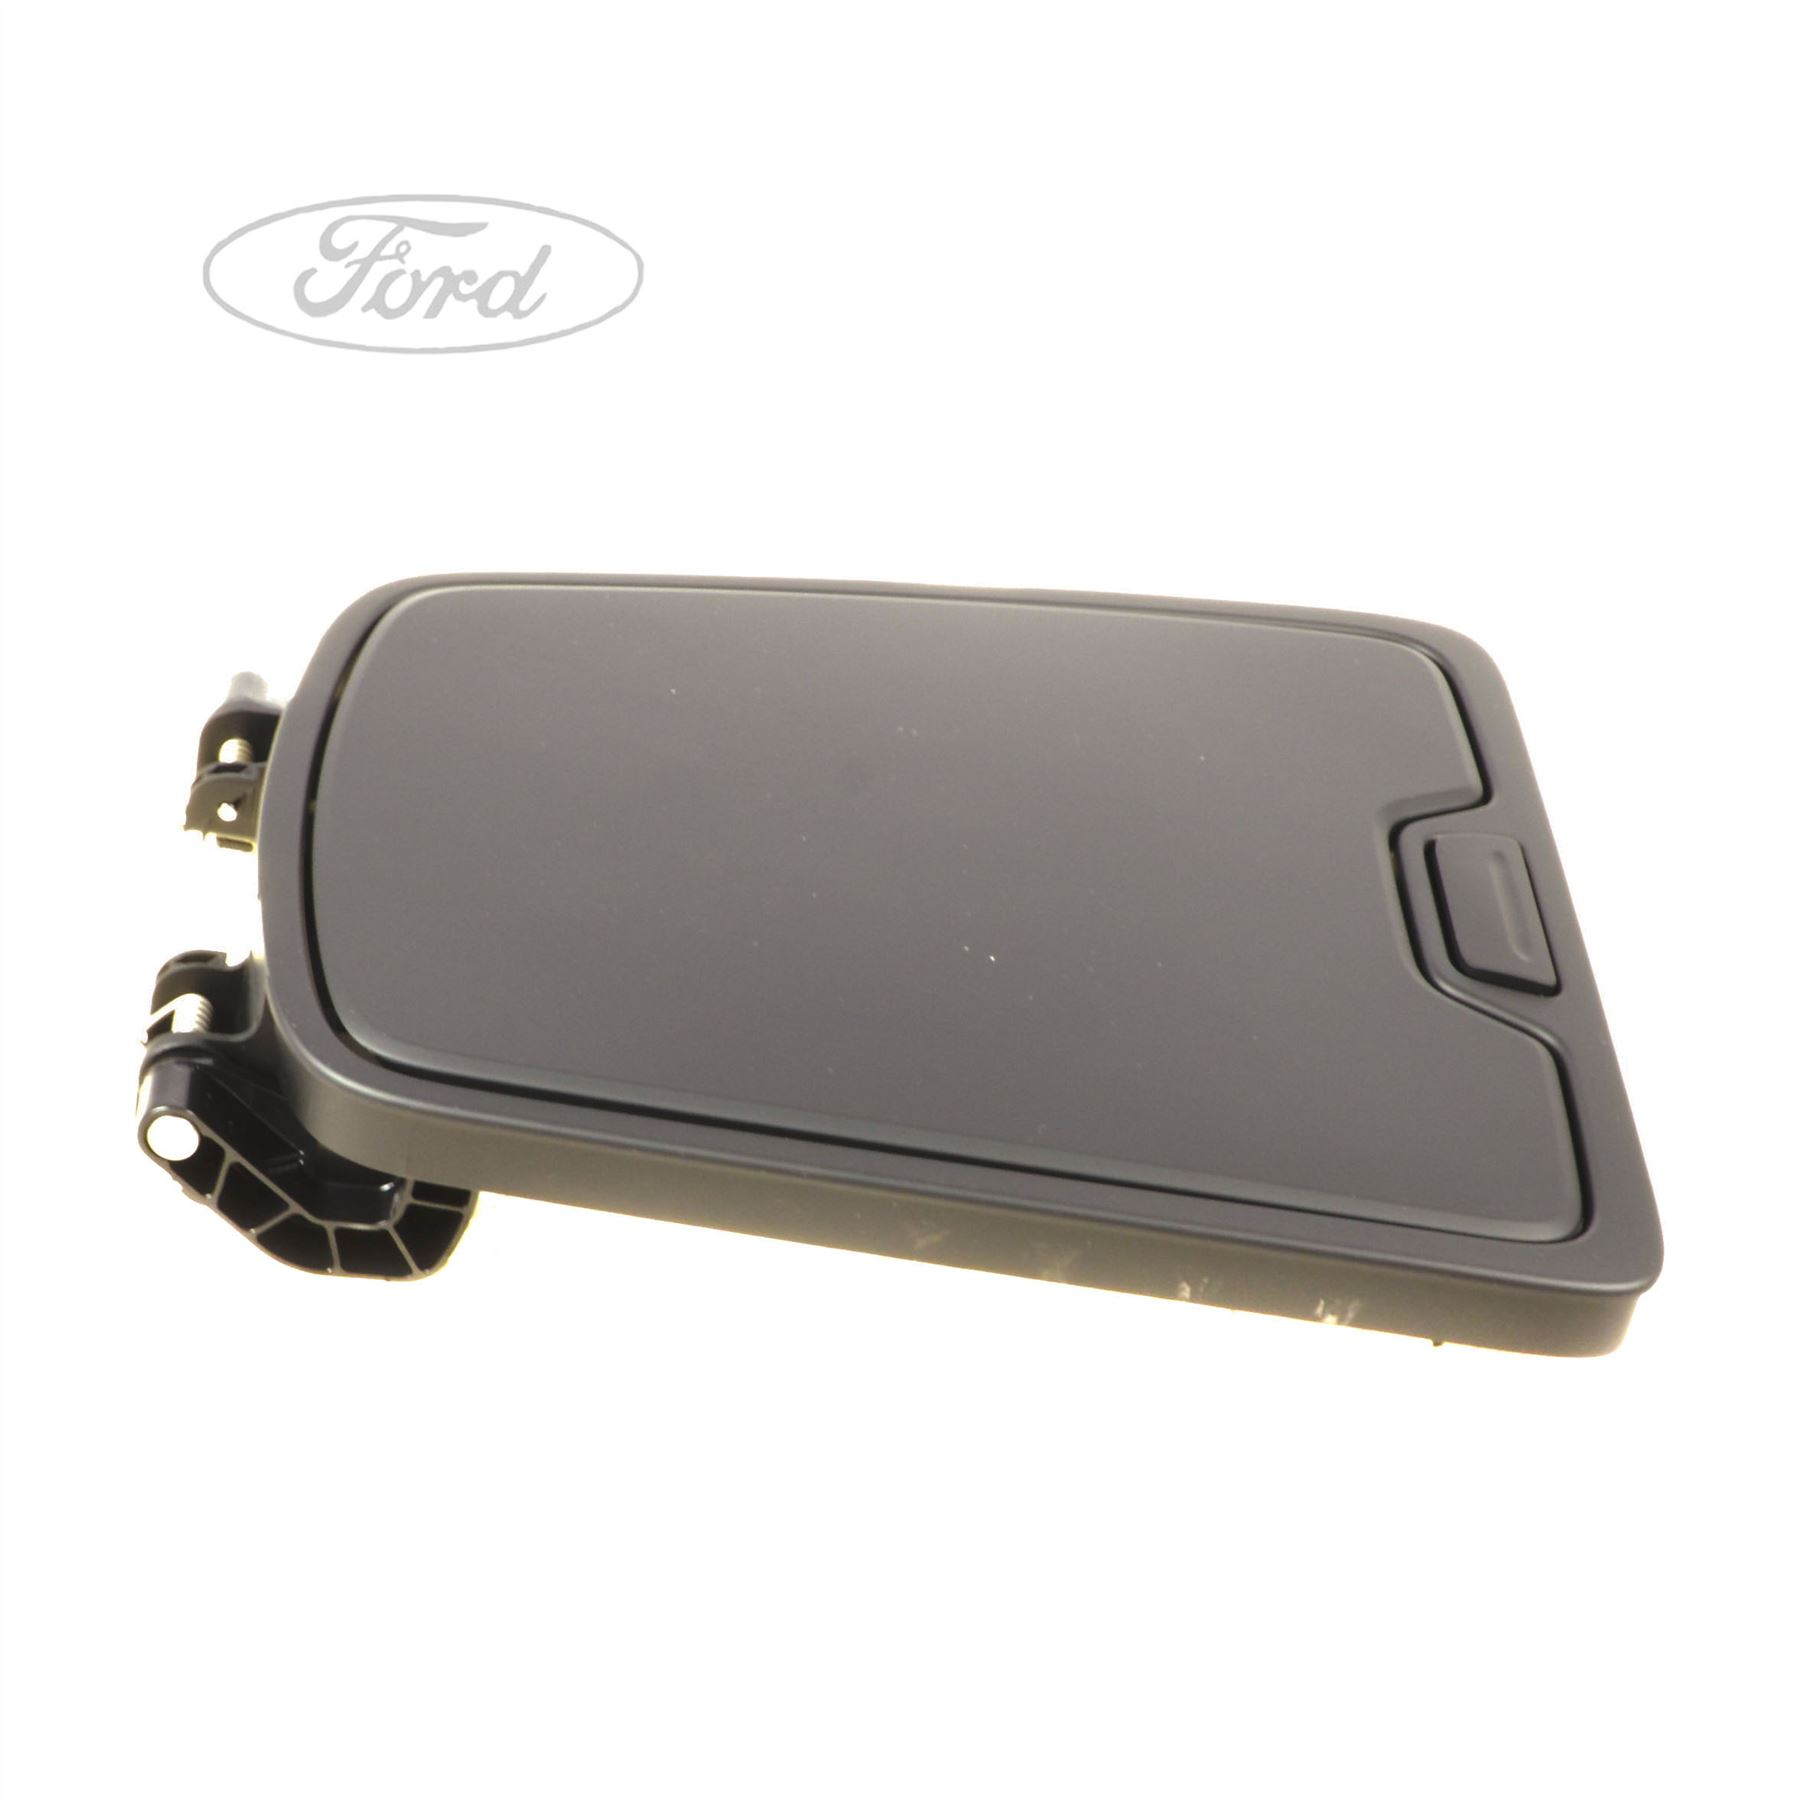 Genuine Ford Dashboard Storage Compartment Lid 1723413 163